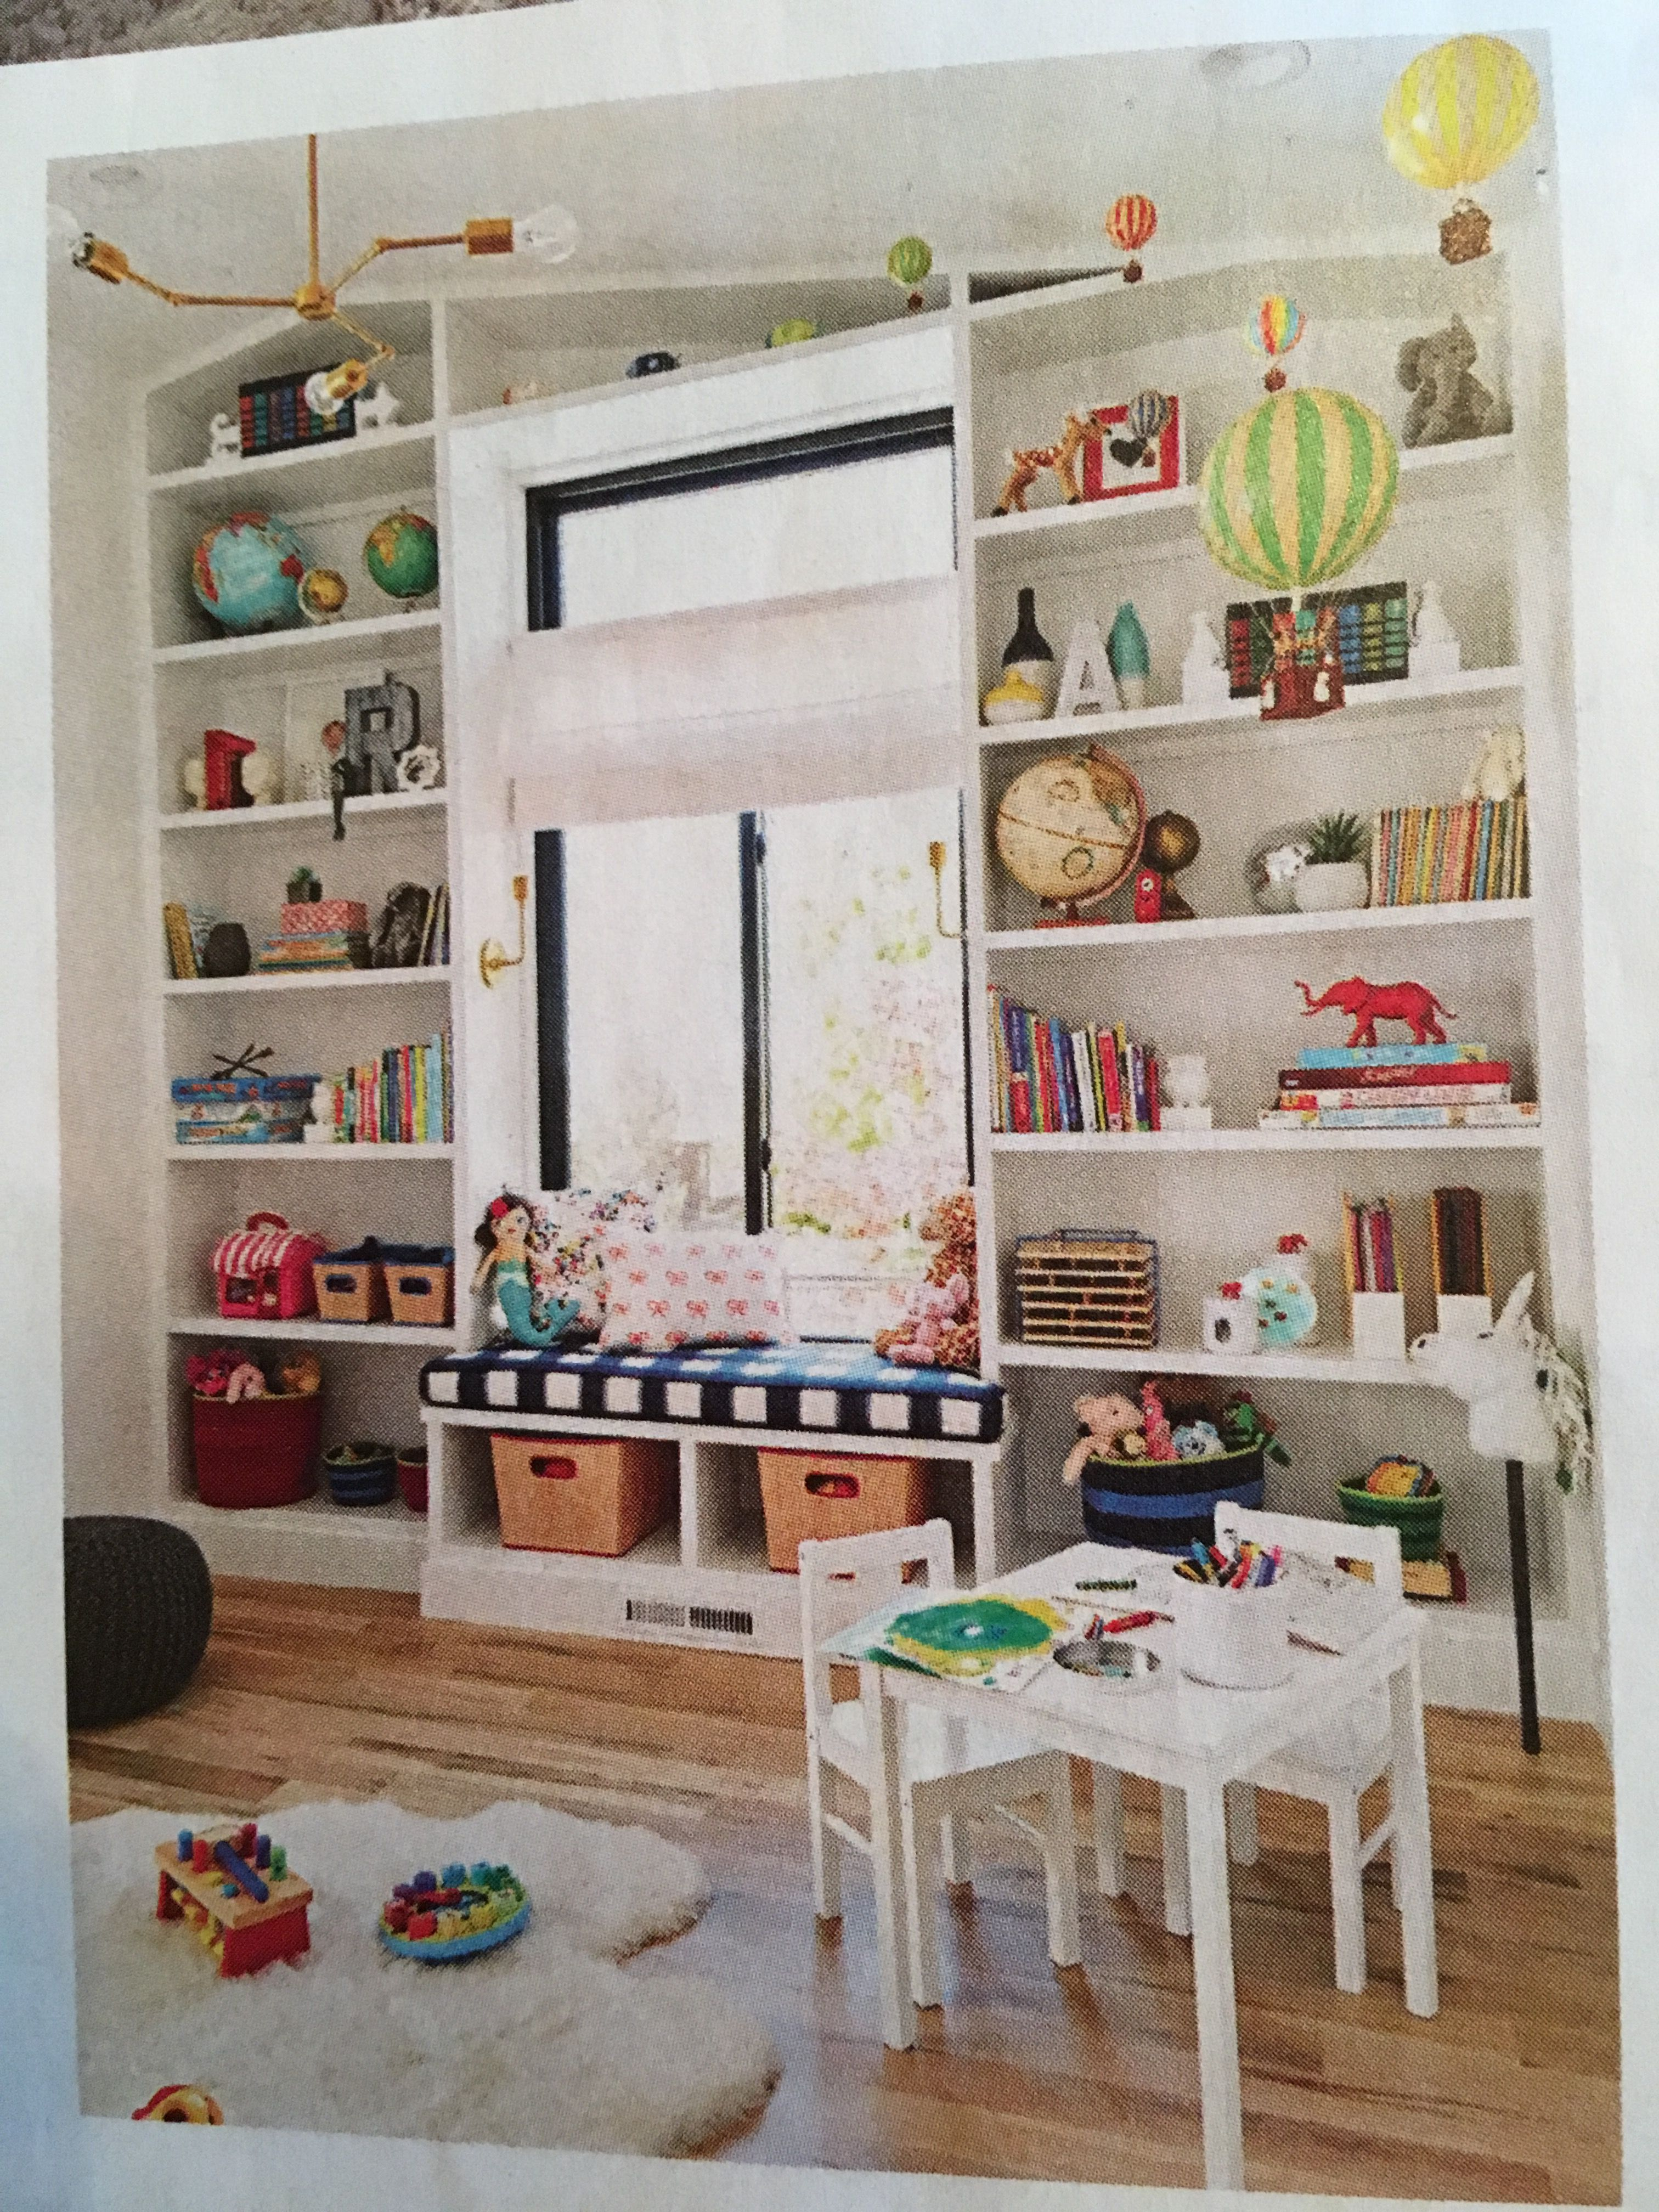 Builtin shelves around a window seat for books toys etc